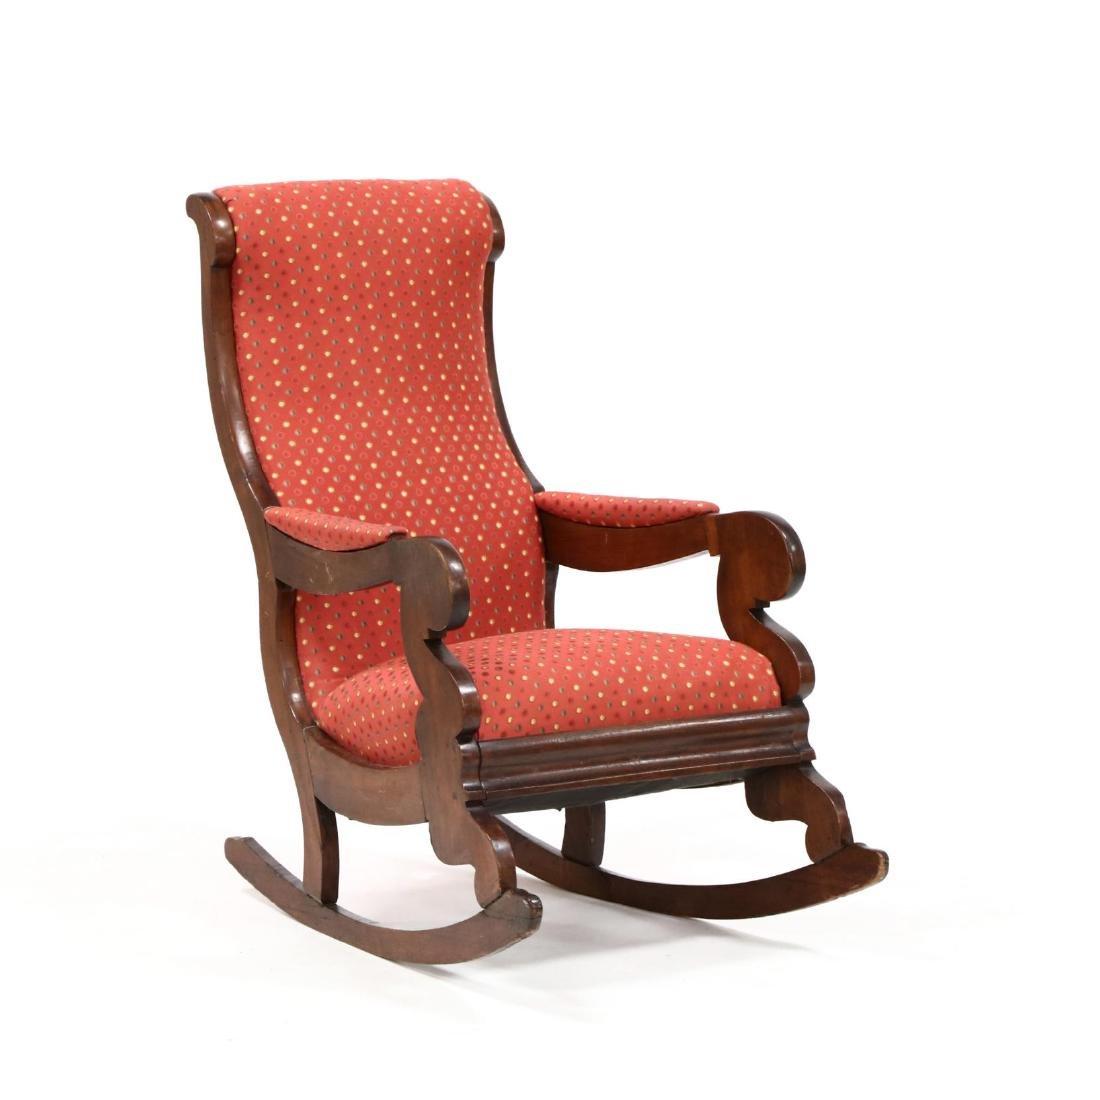 att. Thomas Day, American Classical Rocking Chair